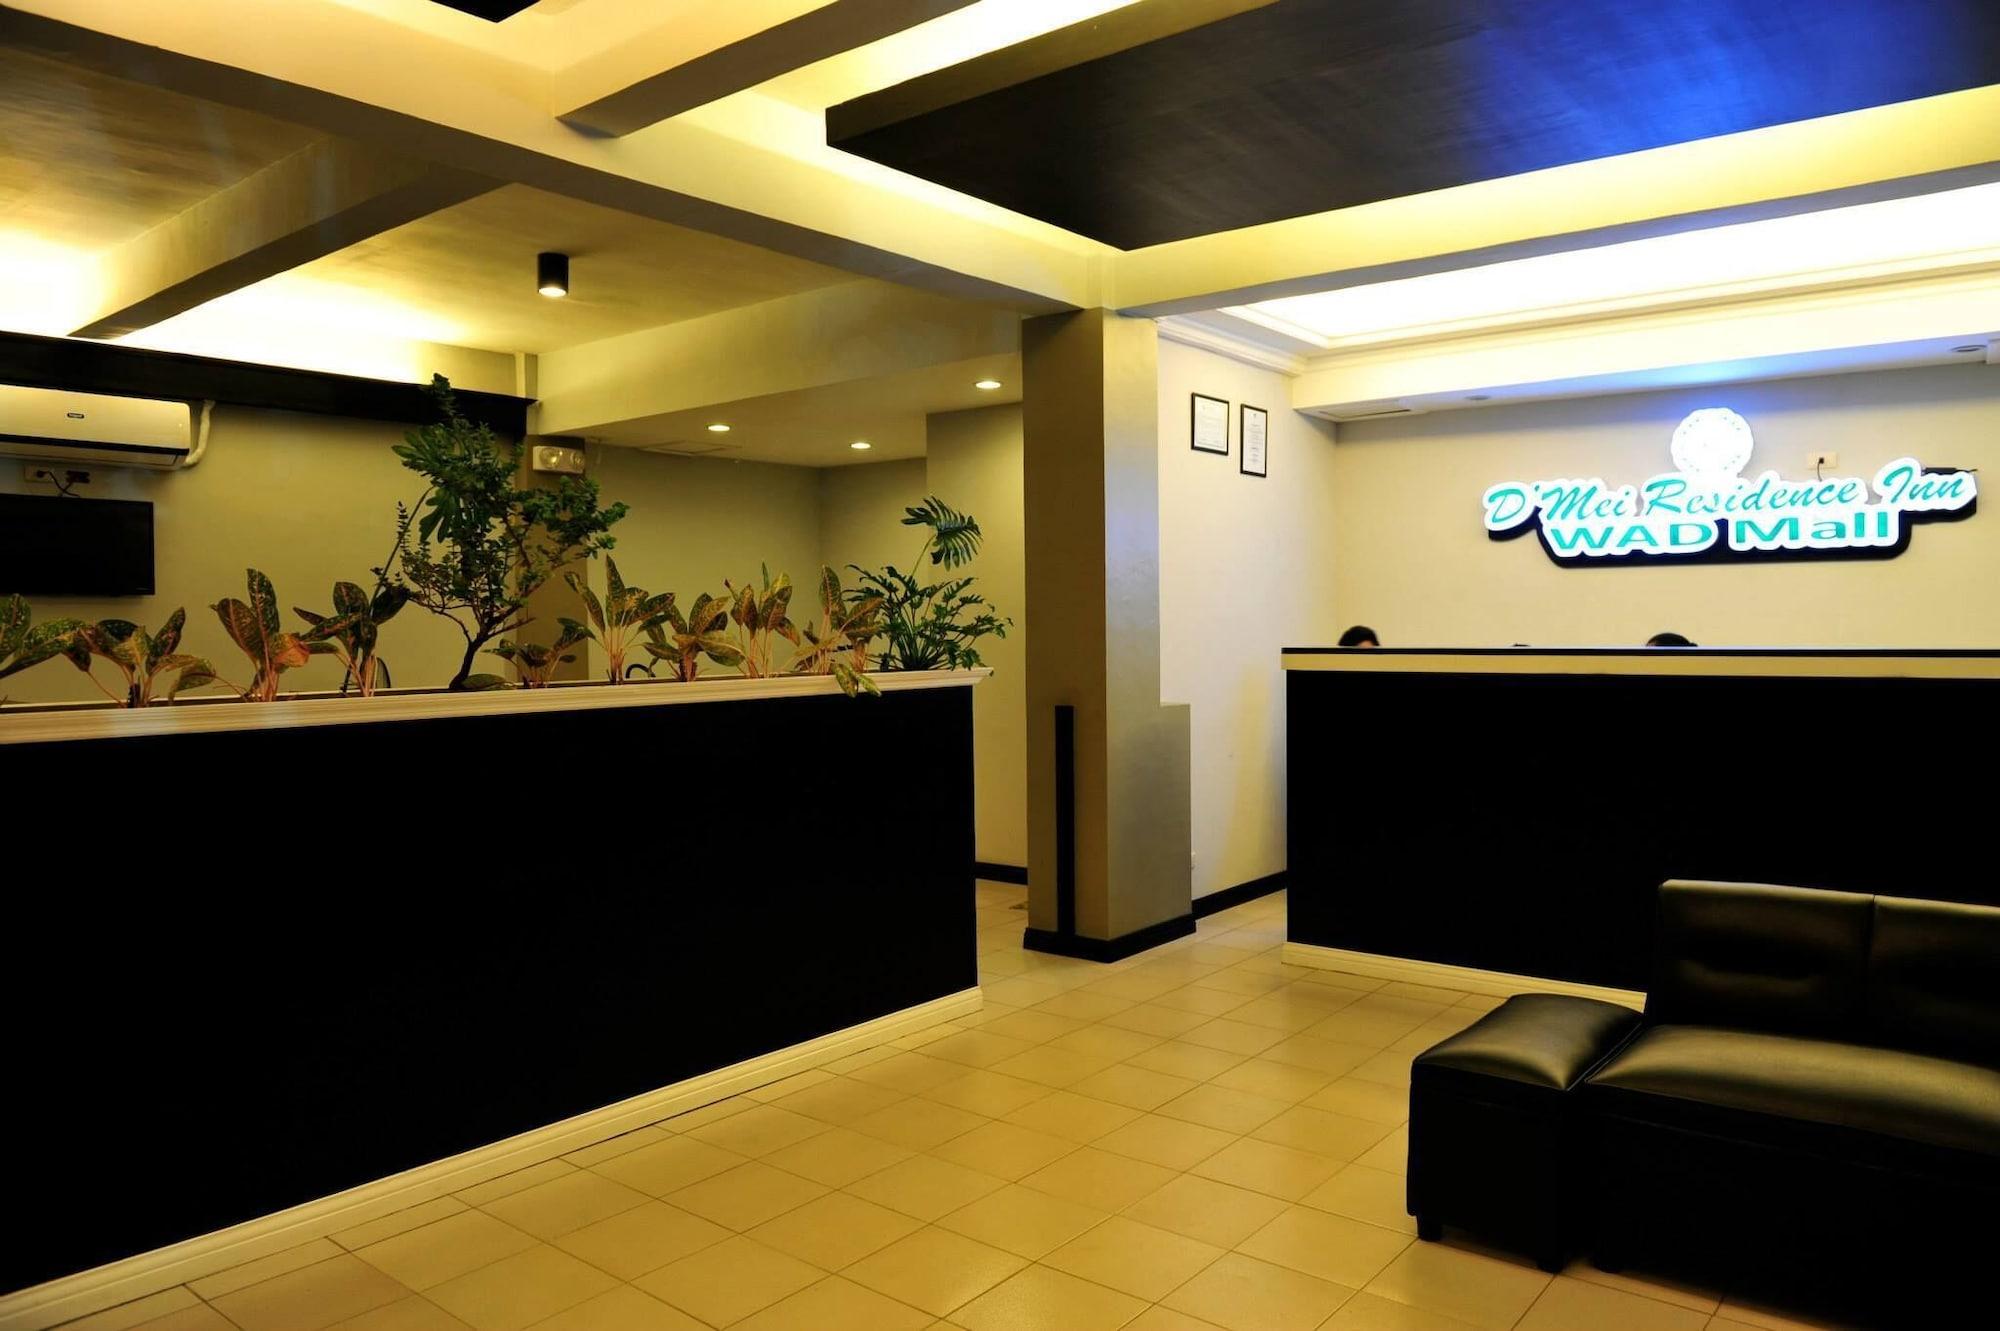 D'Mei Residence Inn - WAD Mall, Naval